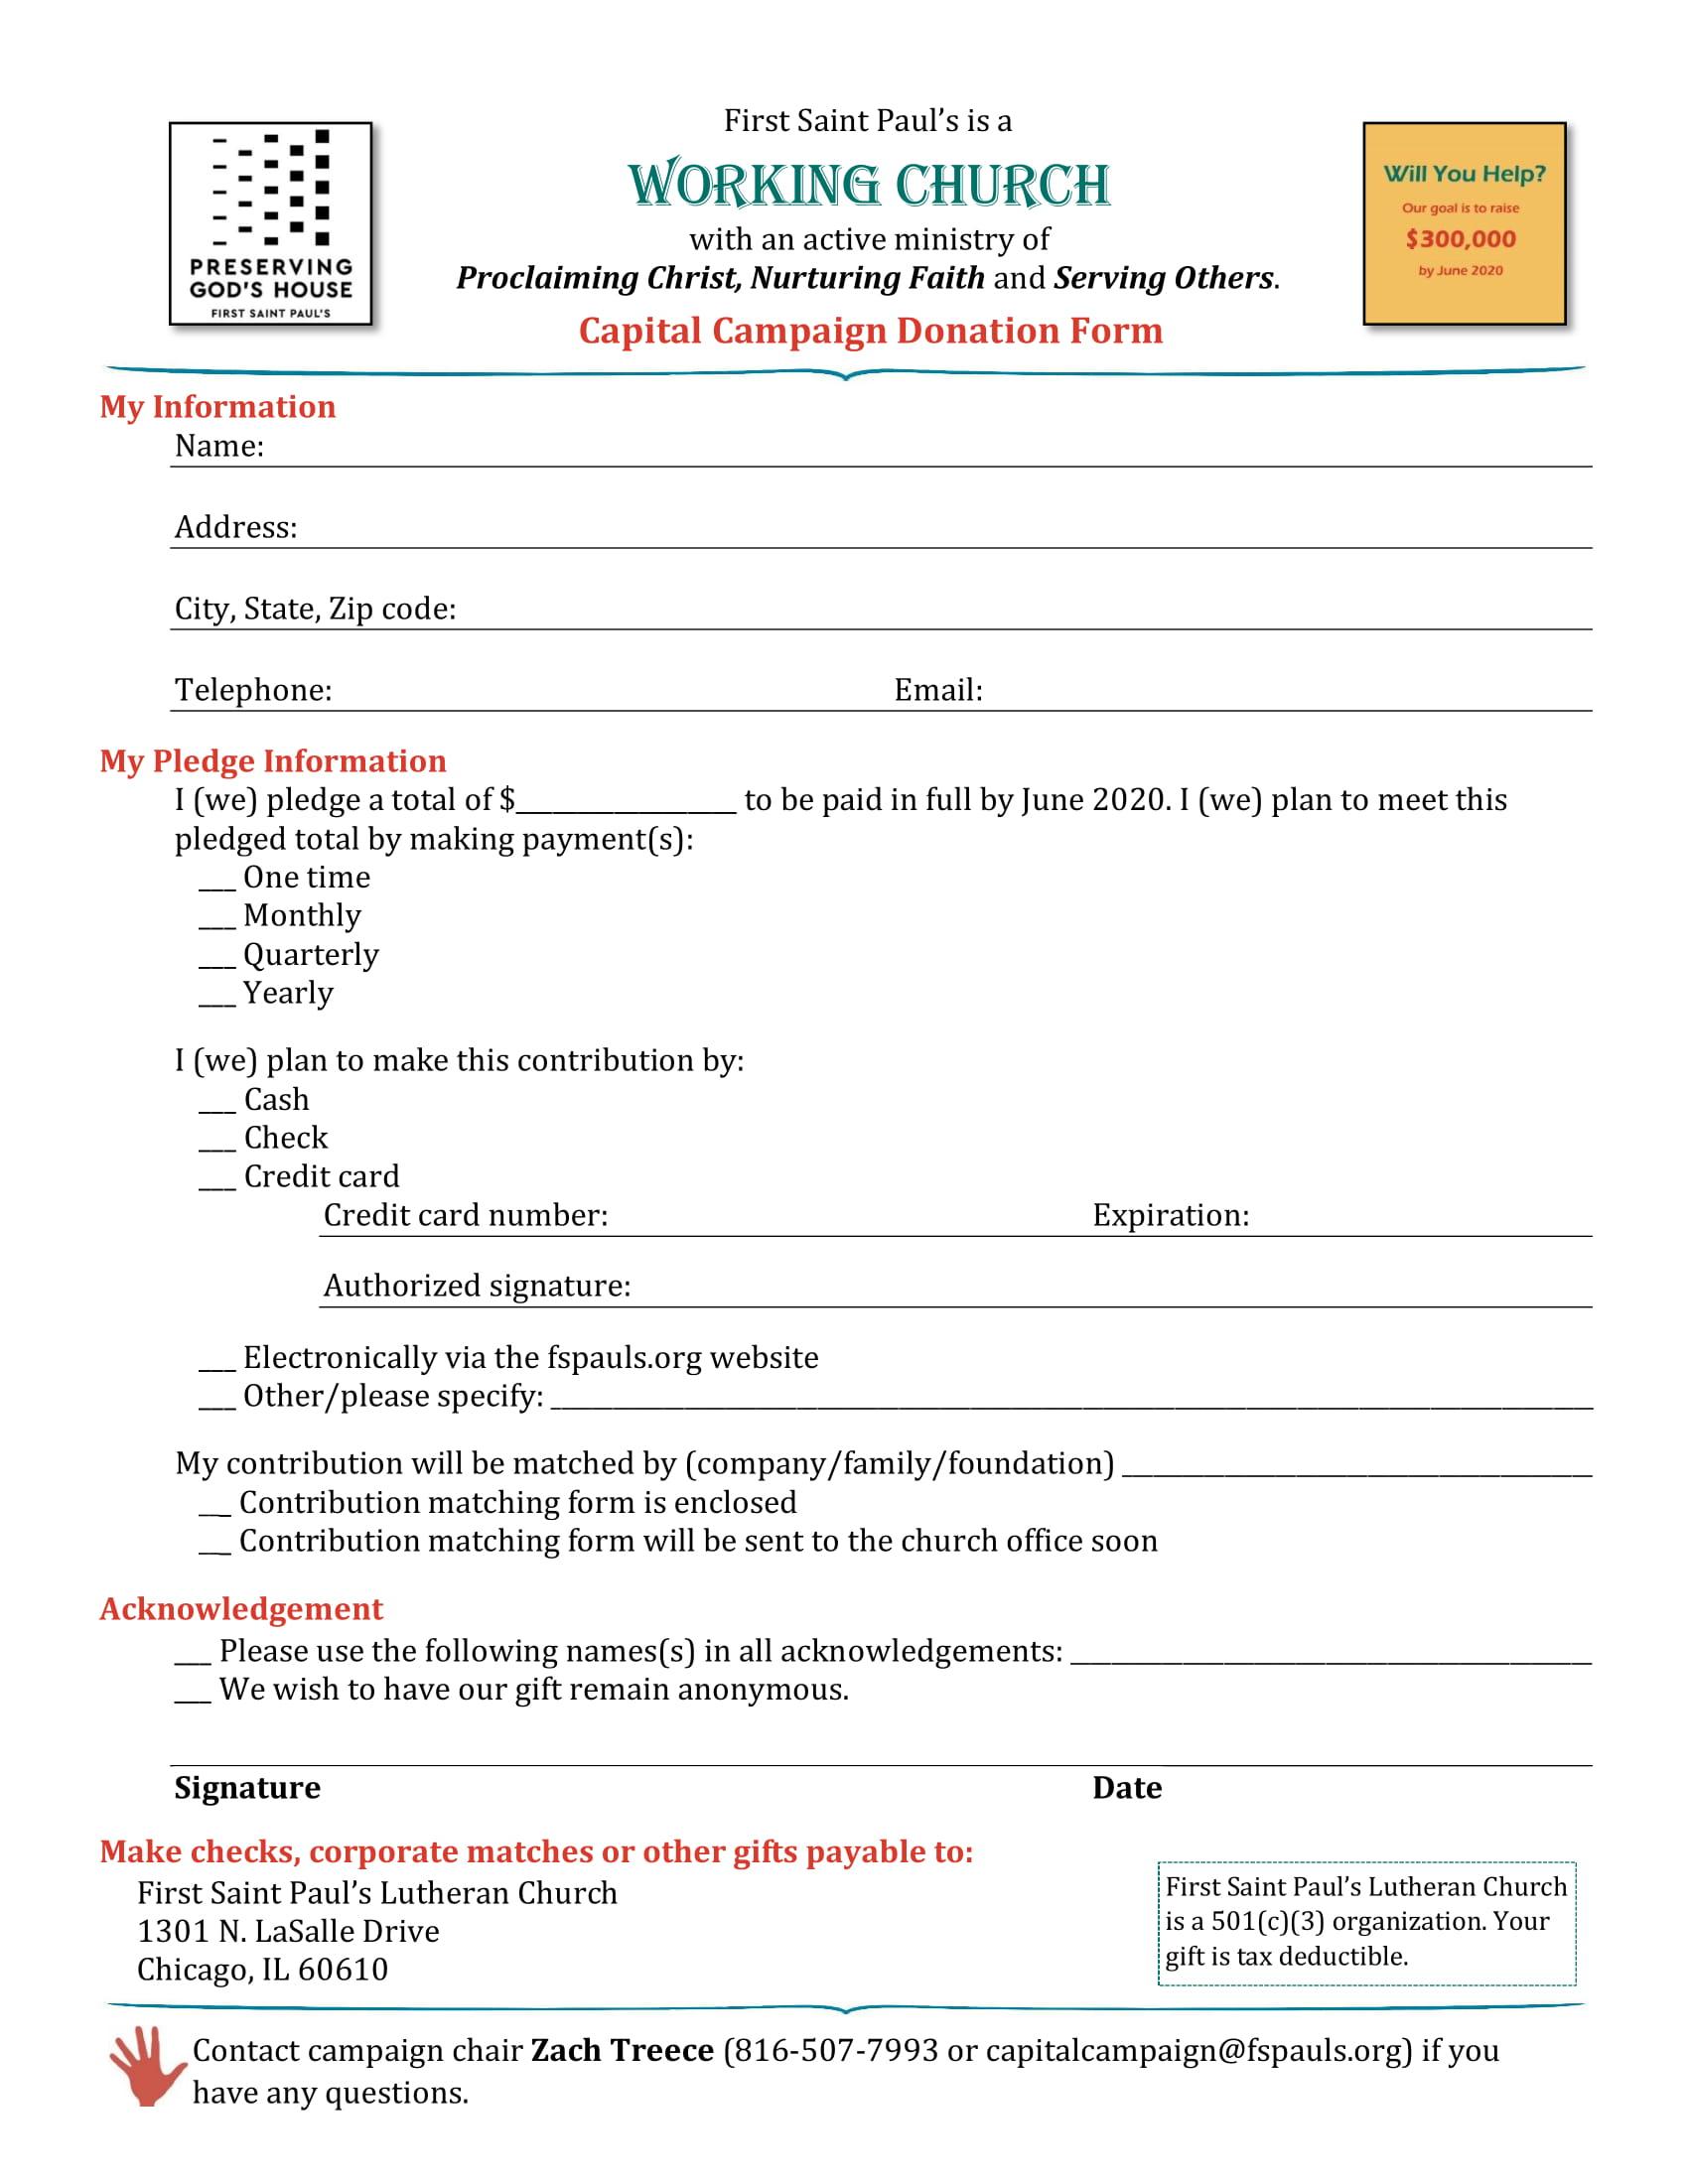 church capital campaign donation form 1